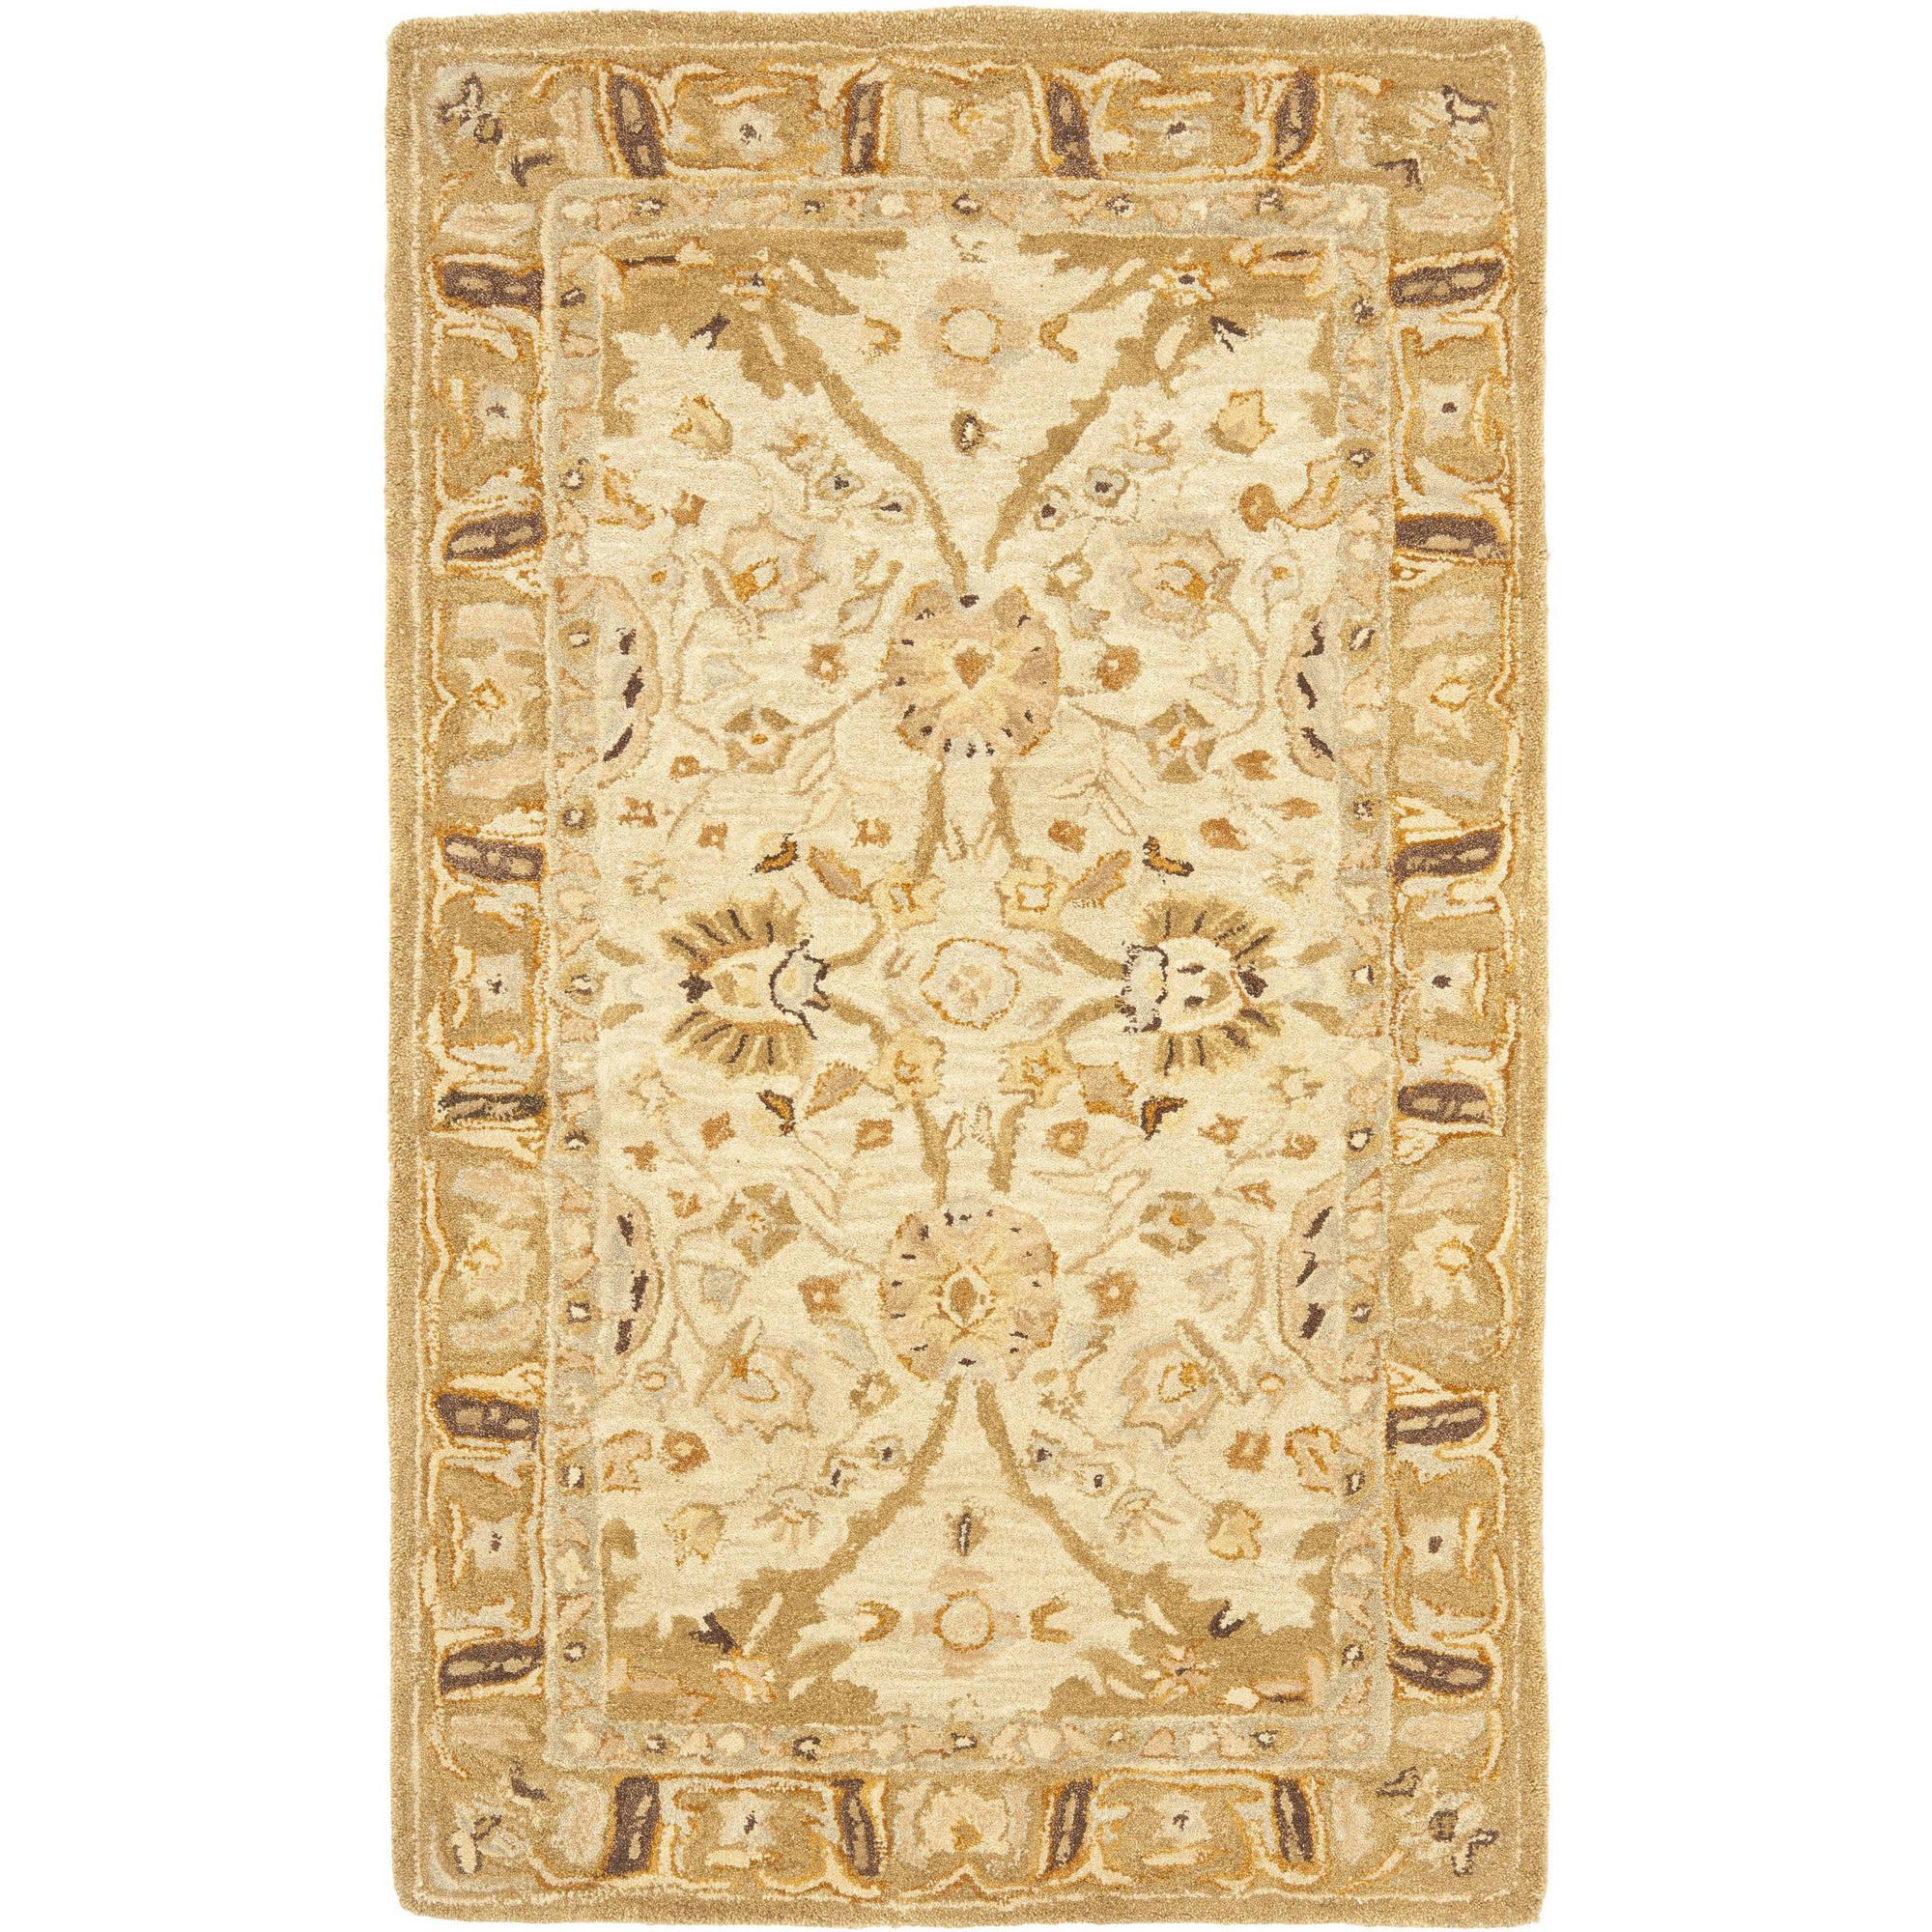 Safavieh Anatolia Sharon Hand-Tufted Wool Area Rug